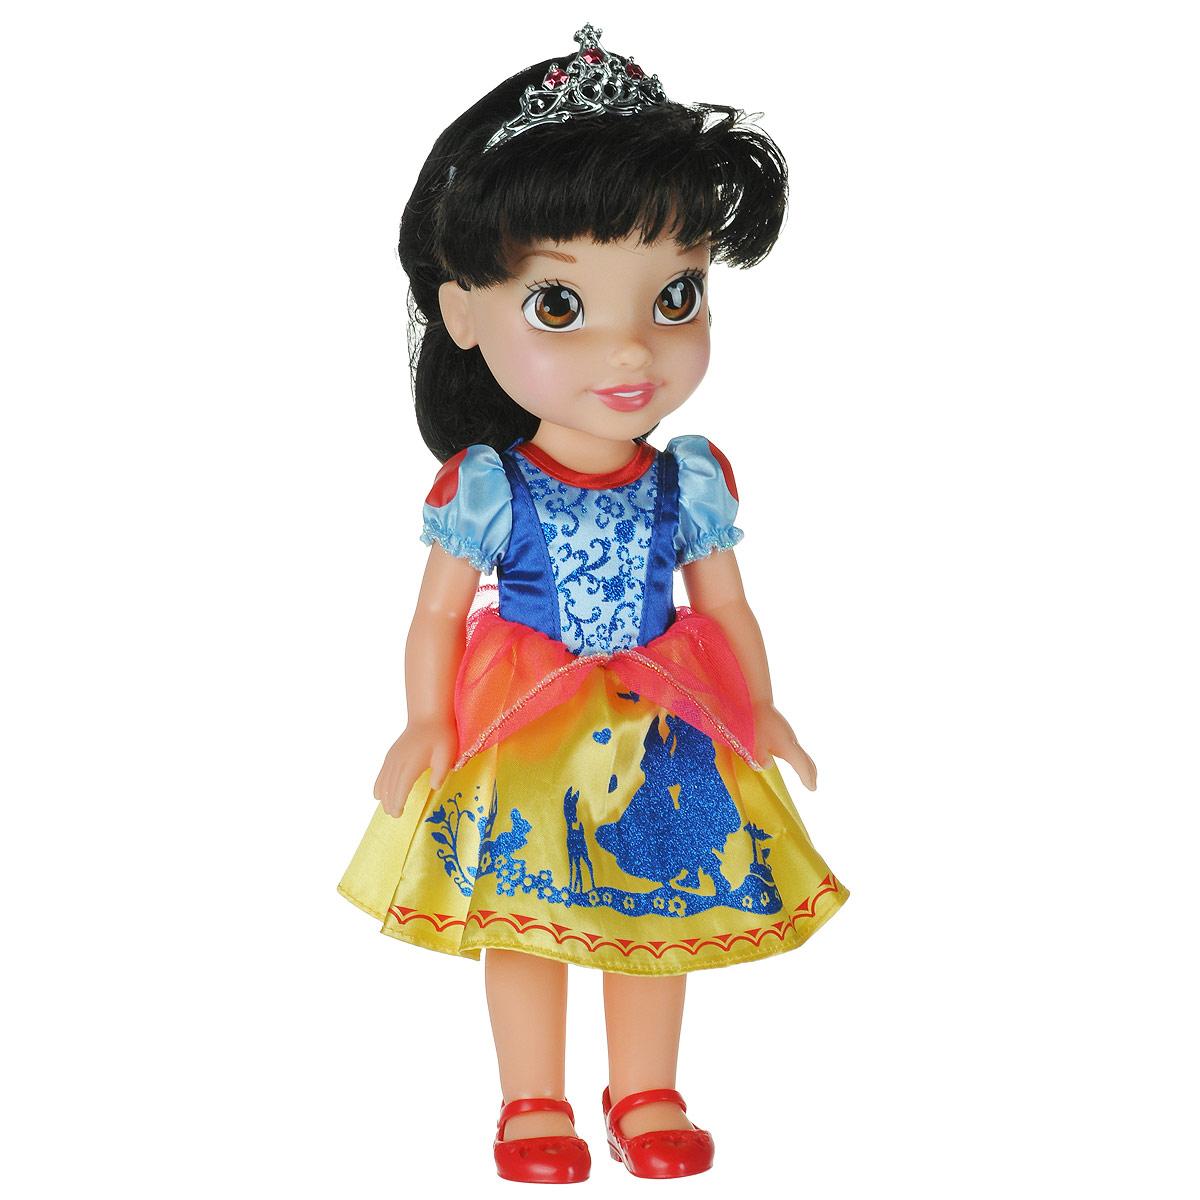 Disney Princess Кукла Малышка Белоснежка